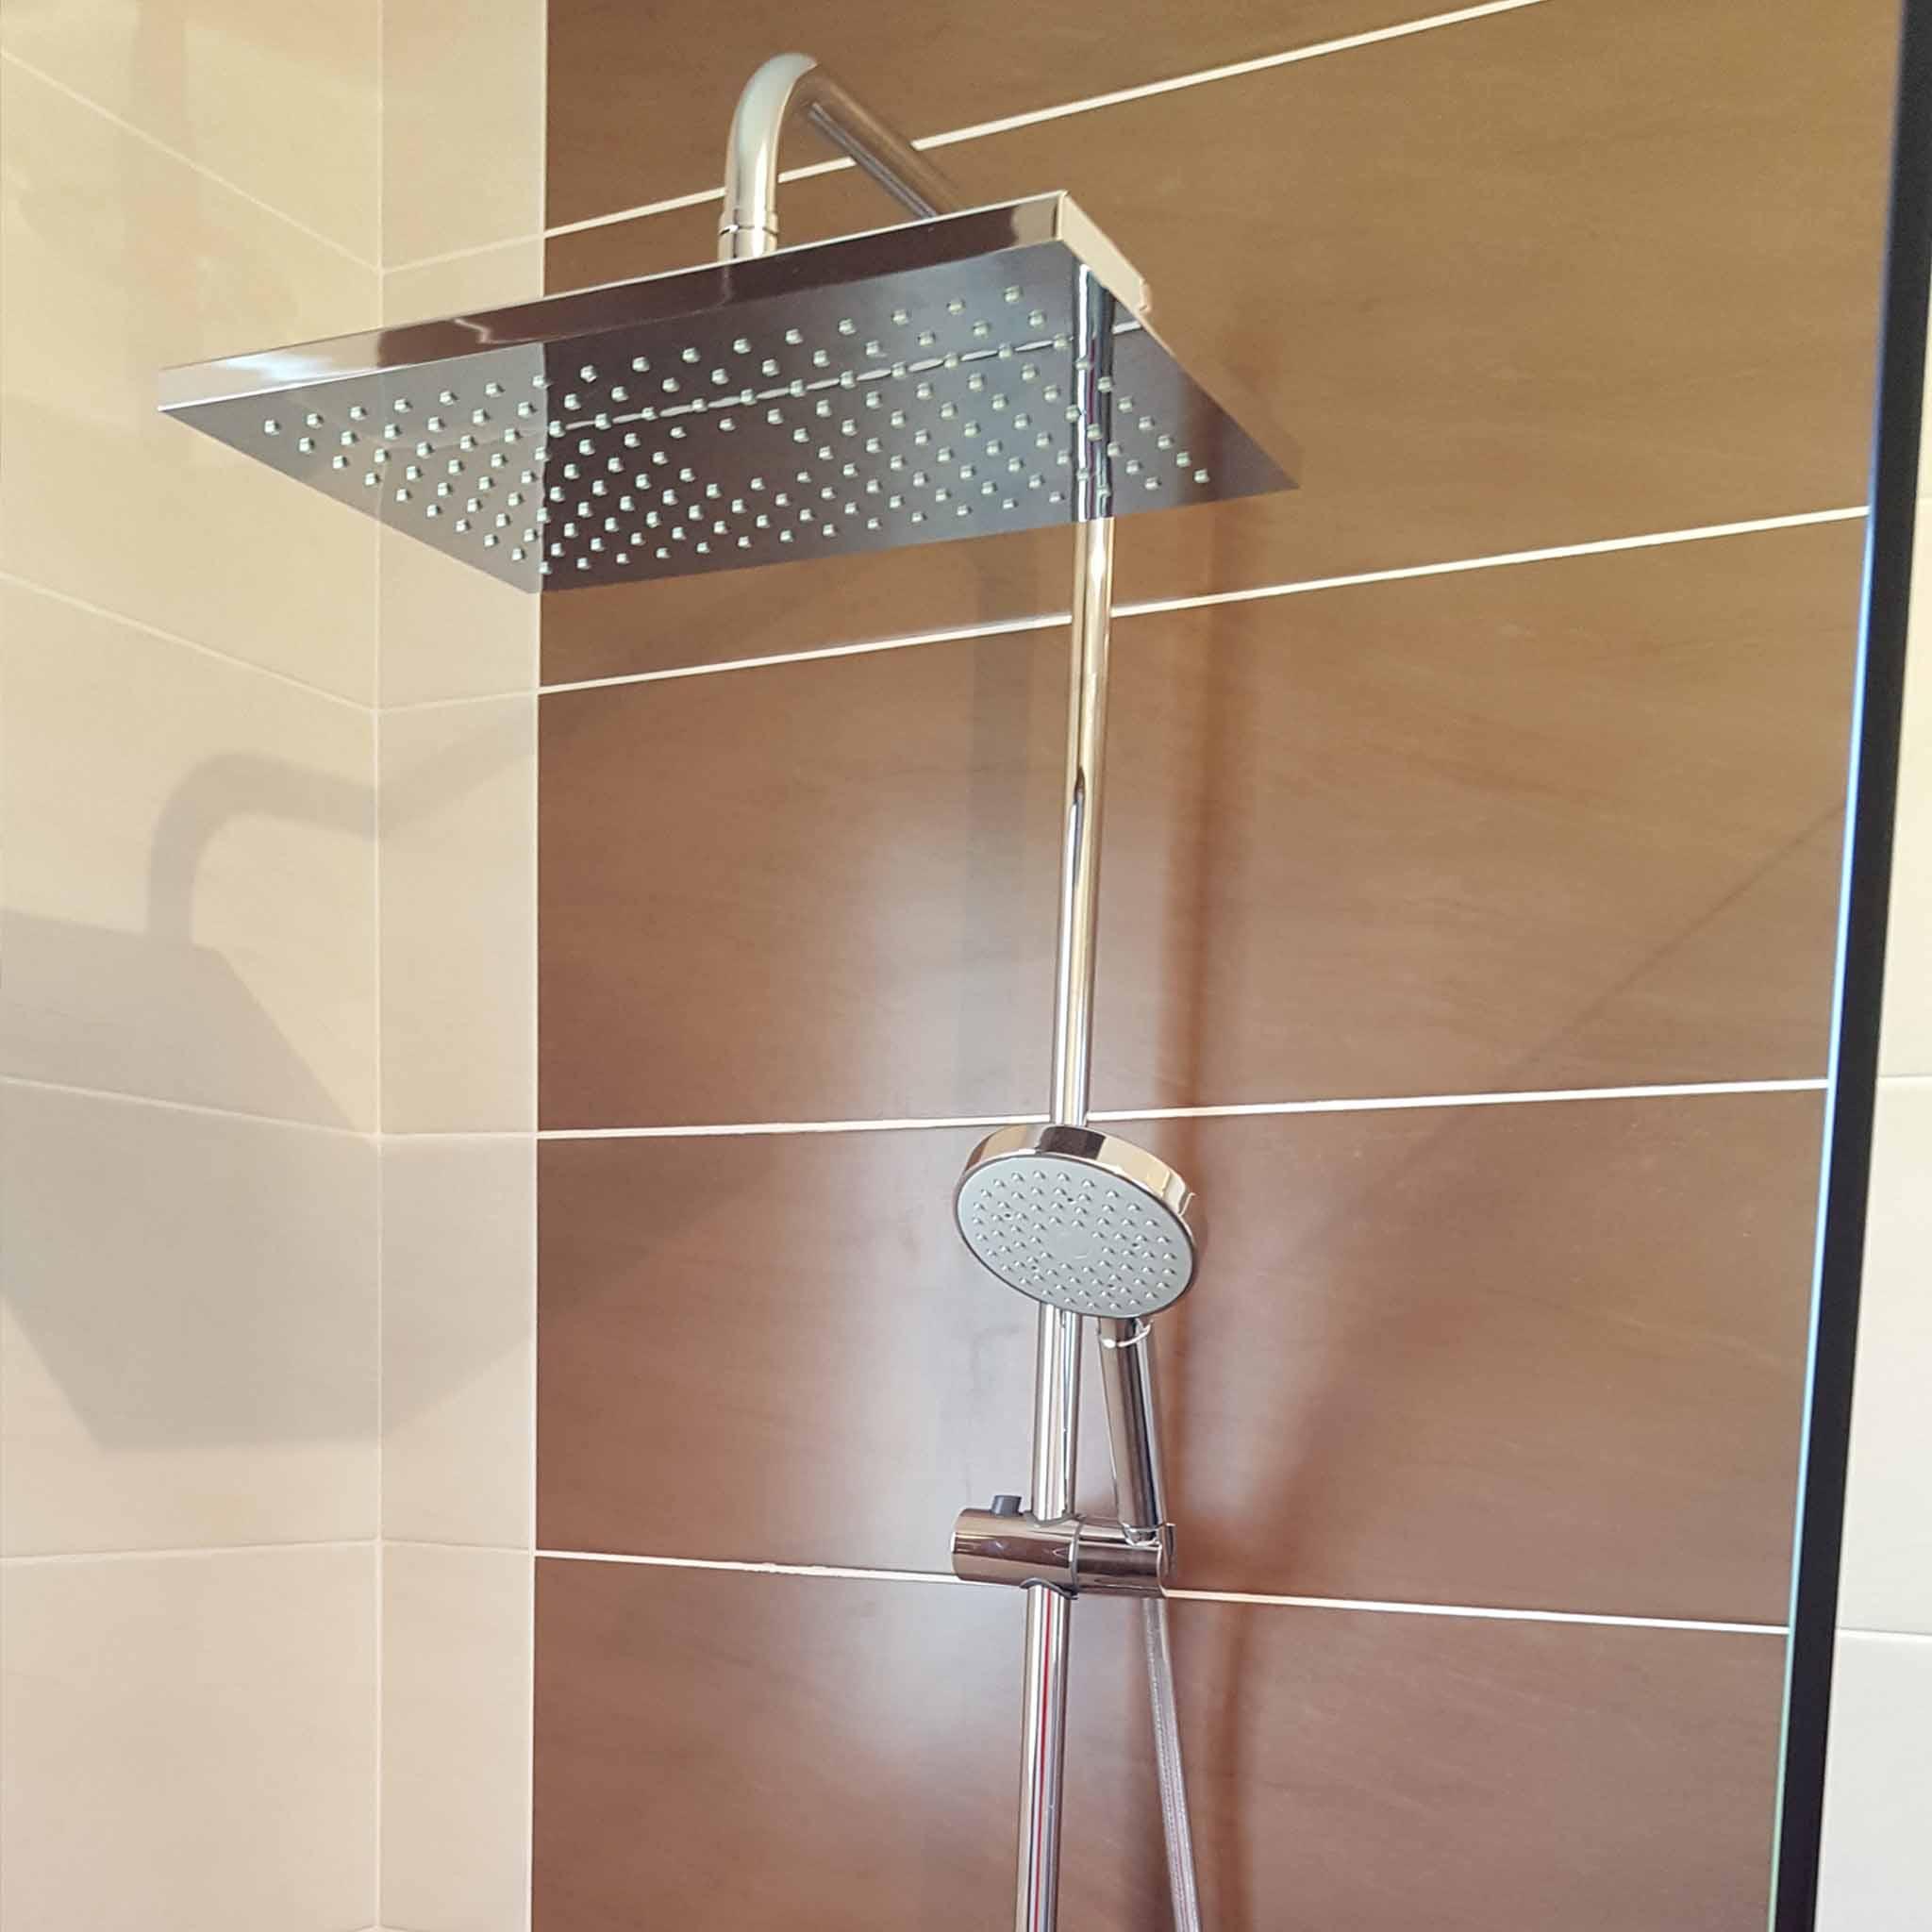 Installation d'une douche